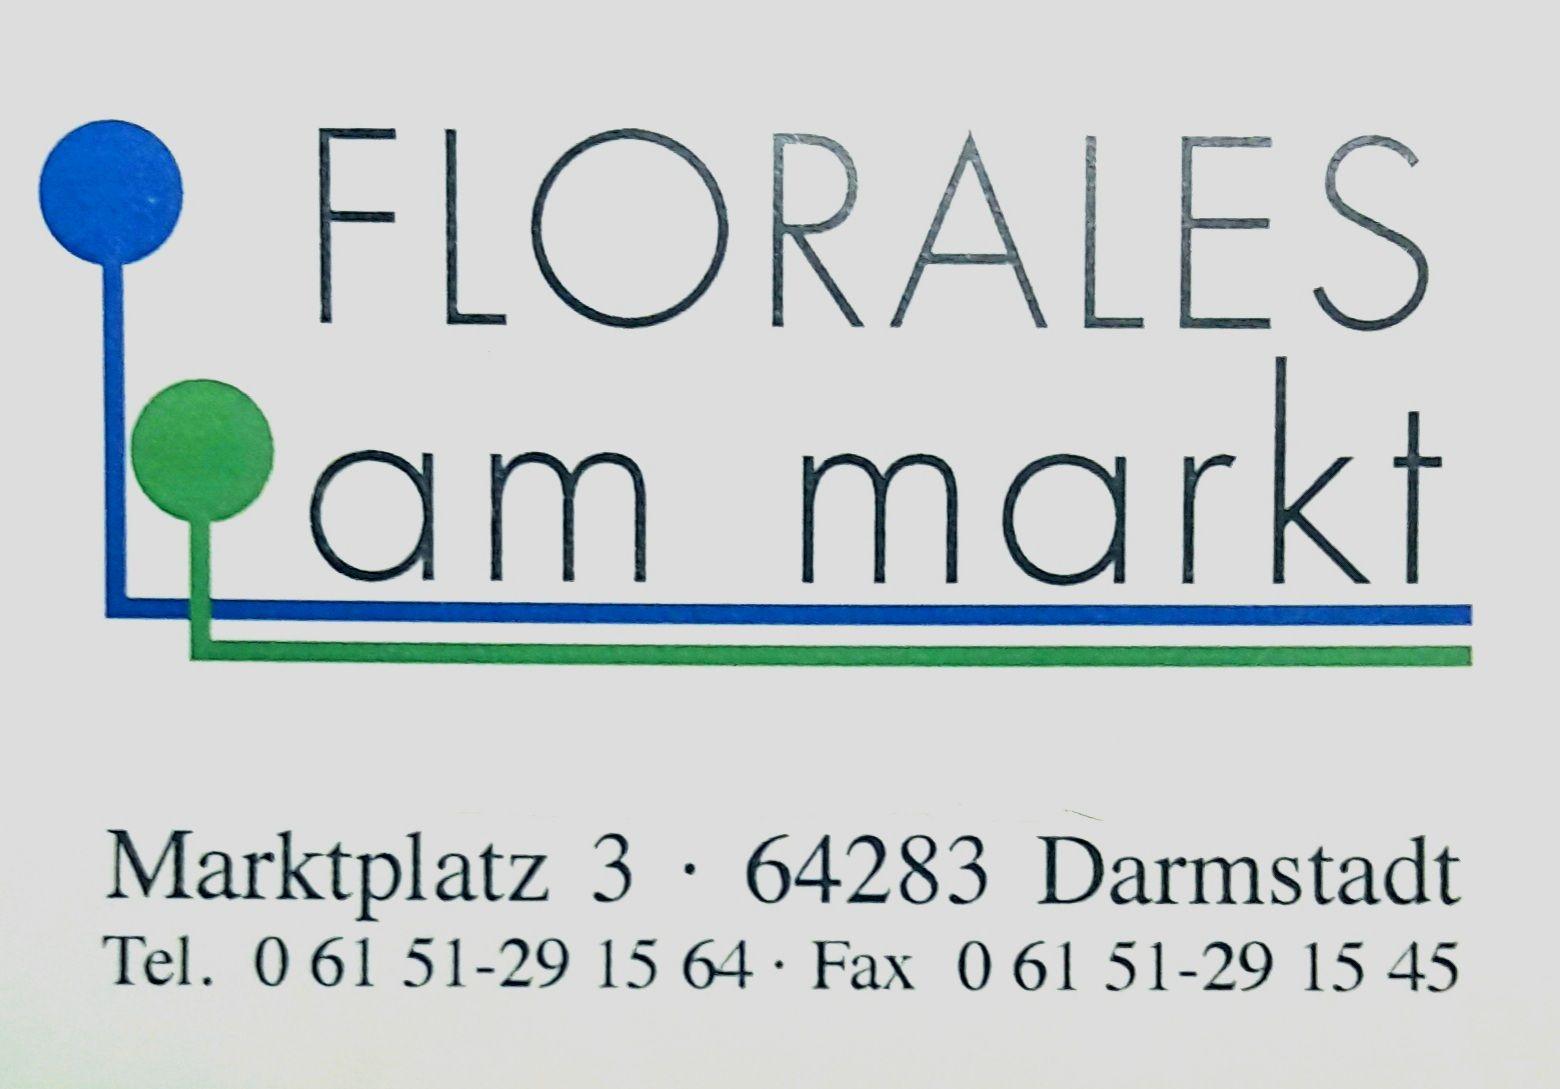 FLORALES am markt